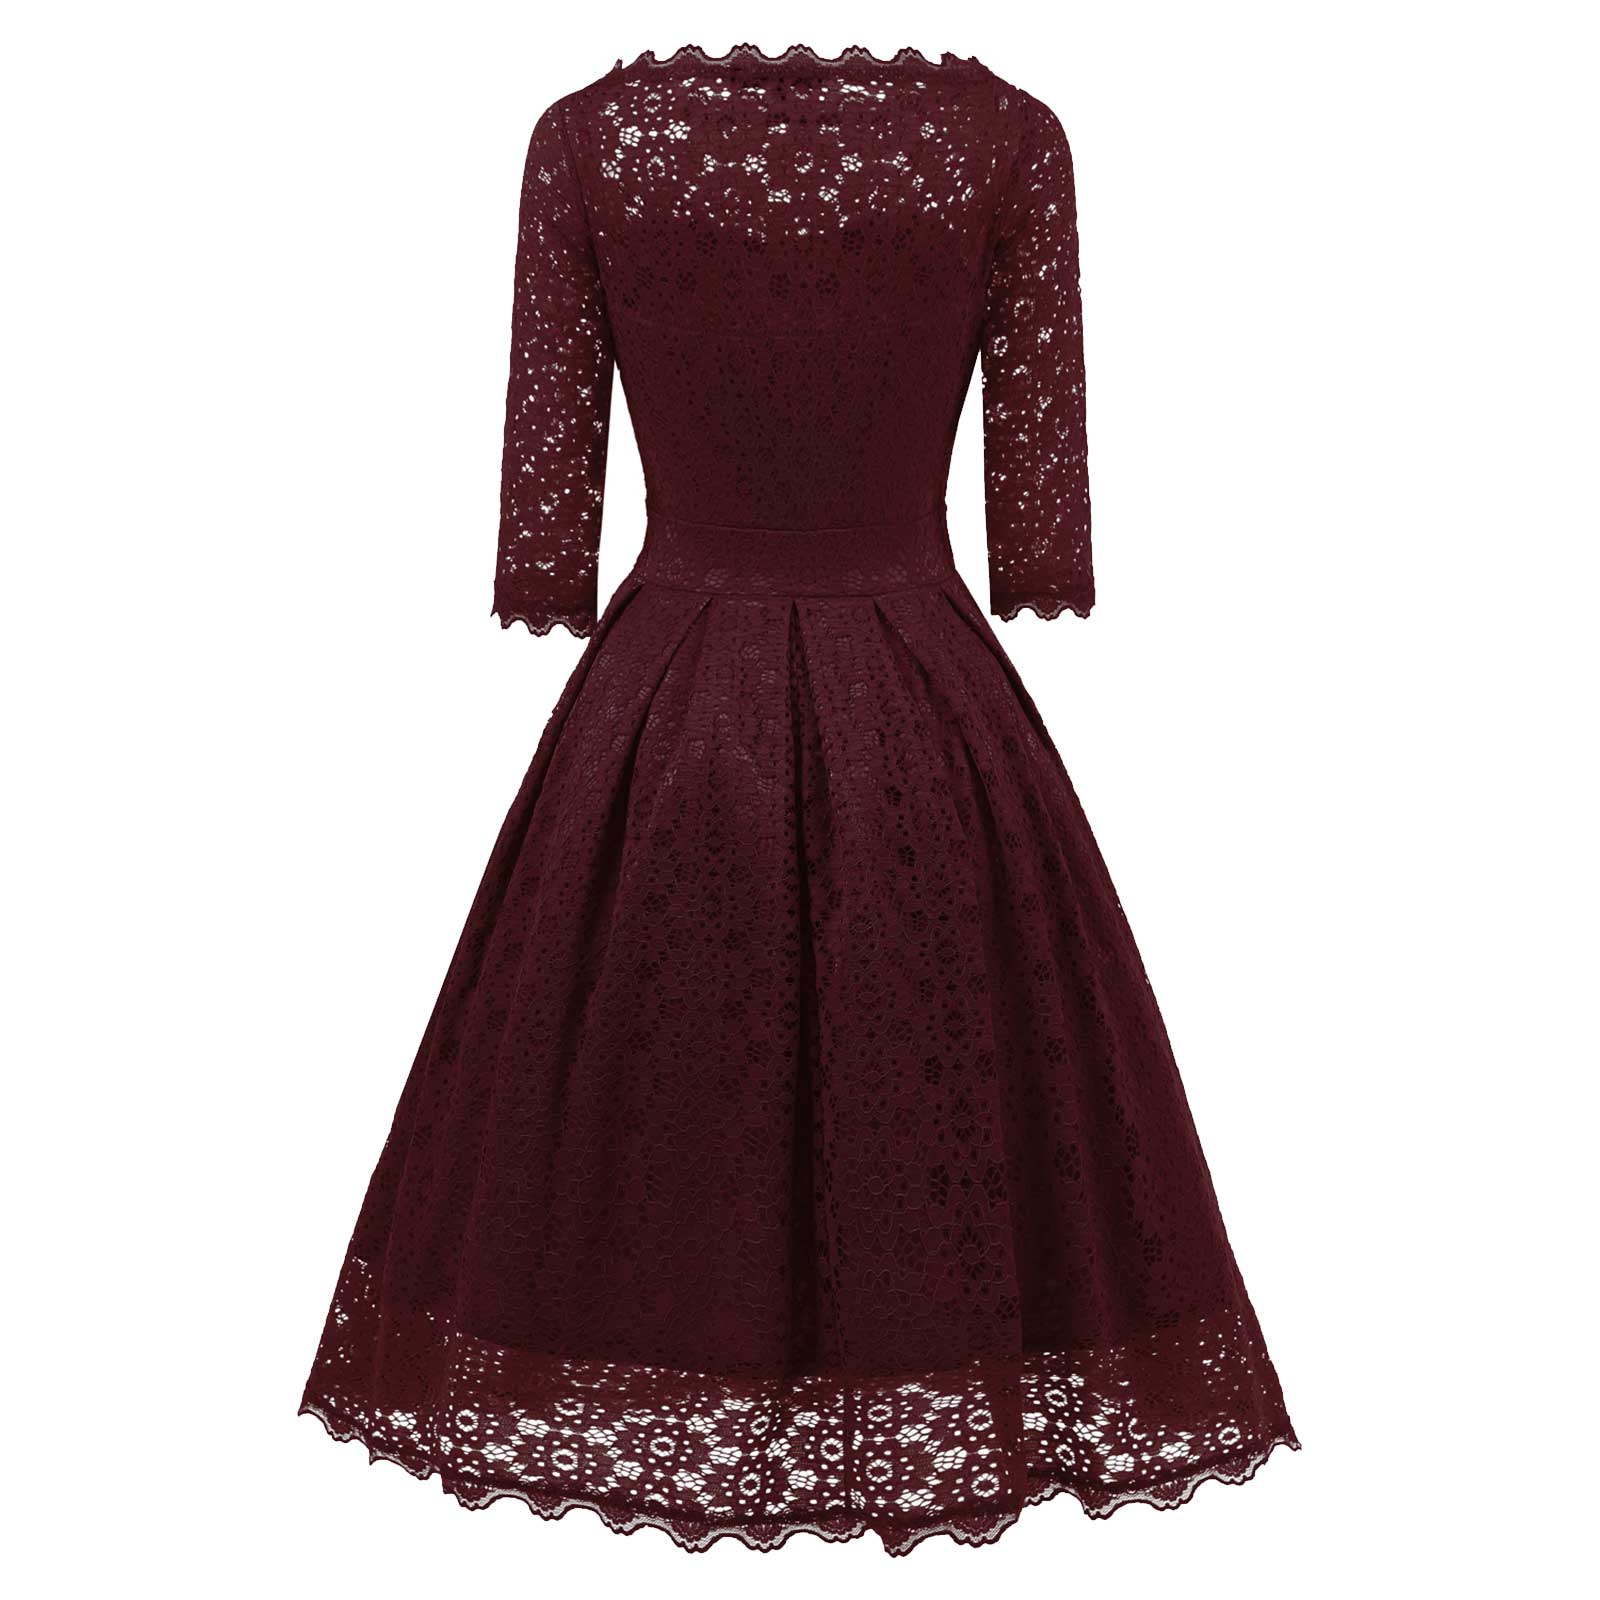 6c54930122fe Women 3 4 Sleeve Vintage Evening Sheer Short Pleated A-Line Midi Dress